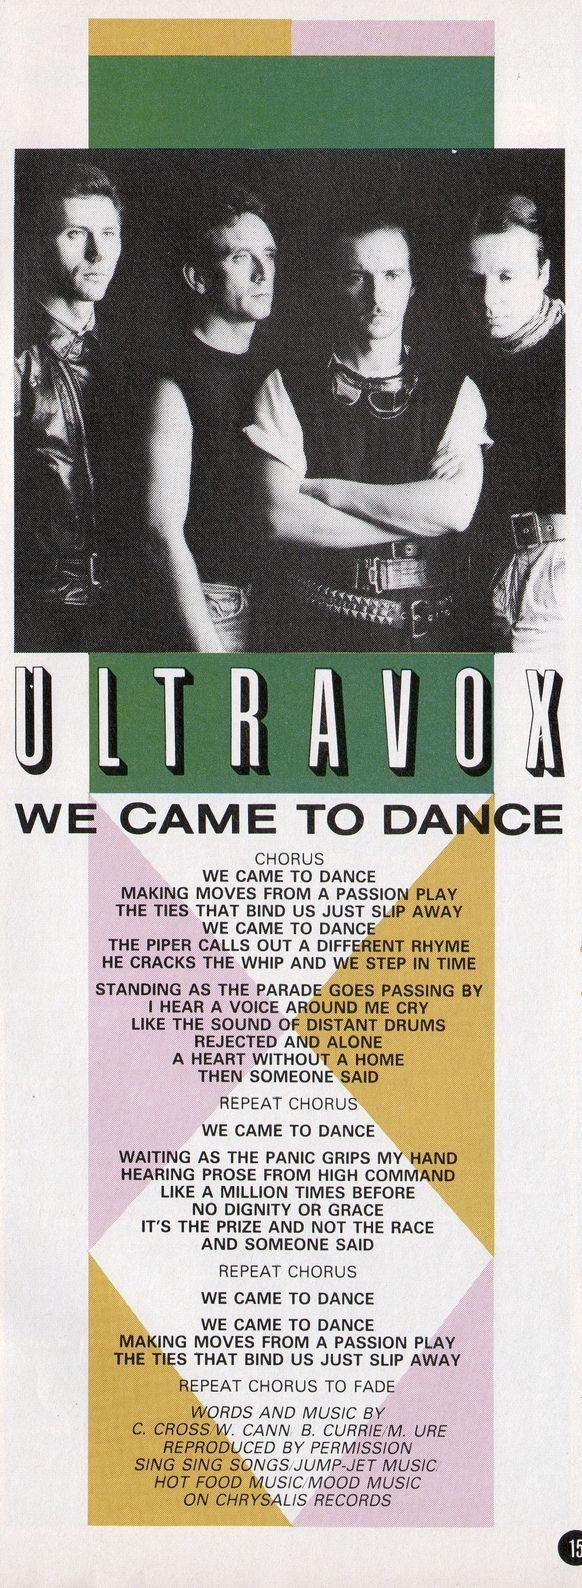 ULTRAVOX - We Came To Dance, 1983